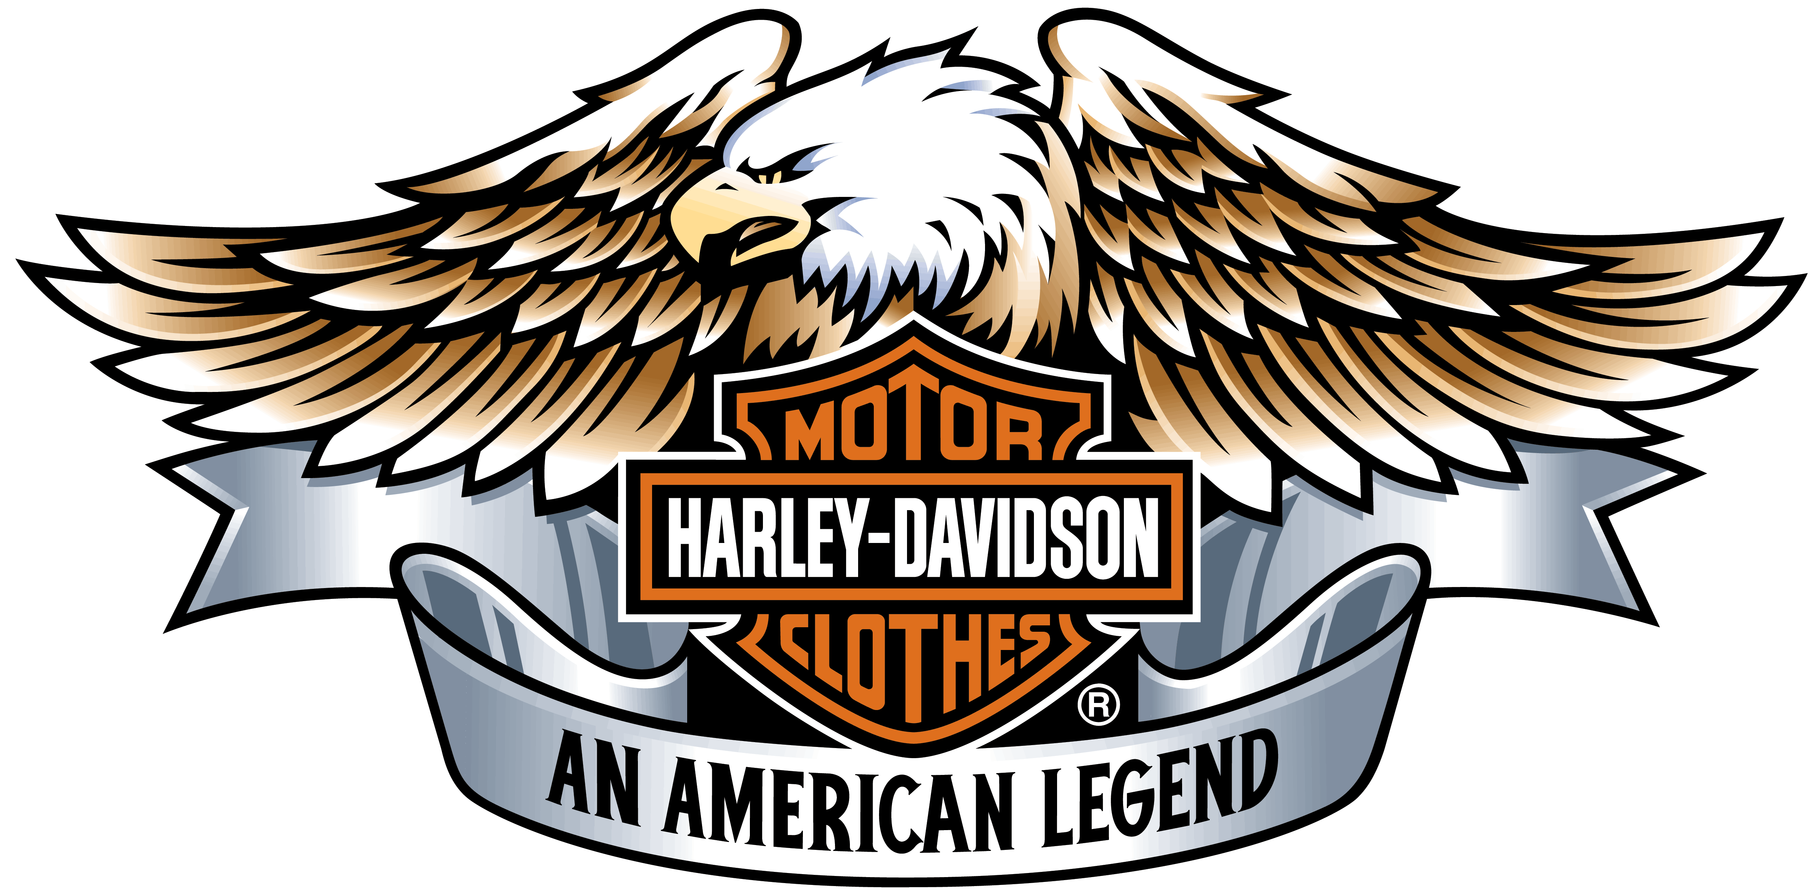 Harley Davidson Motorcycles Manual Pdf Wiring Diagram Fault Codes